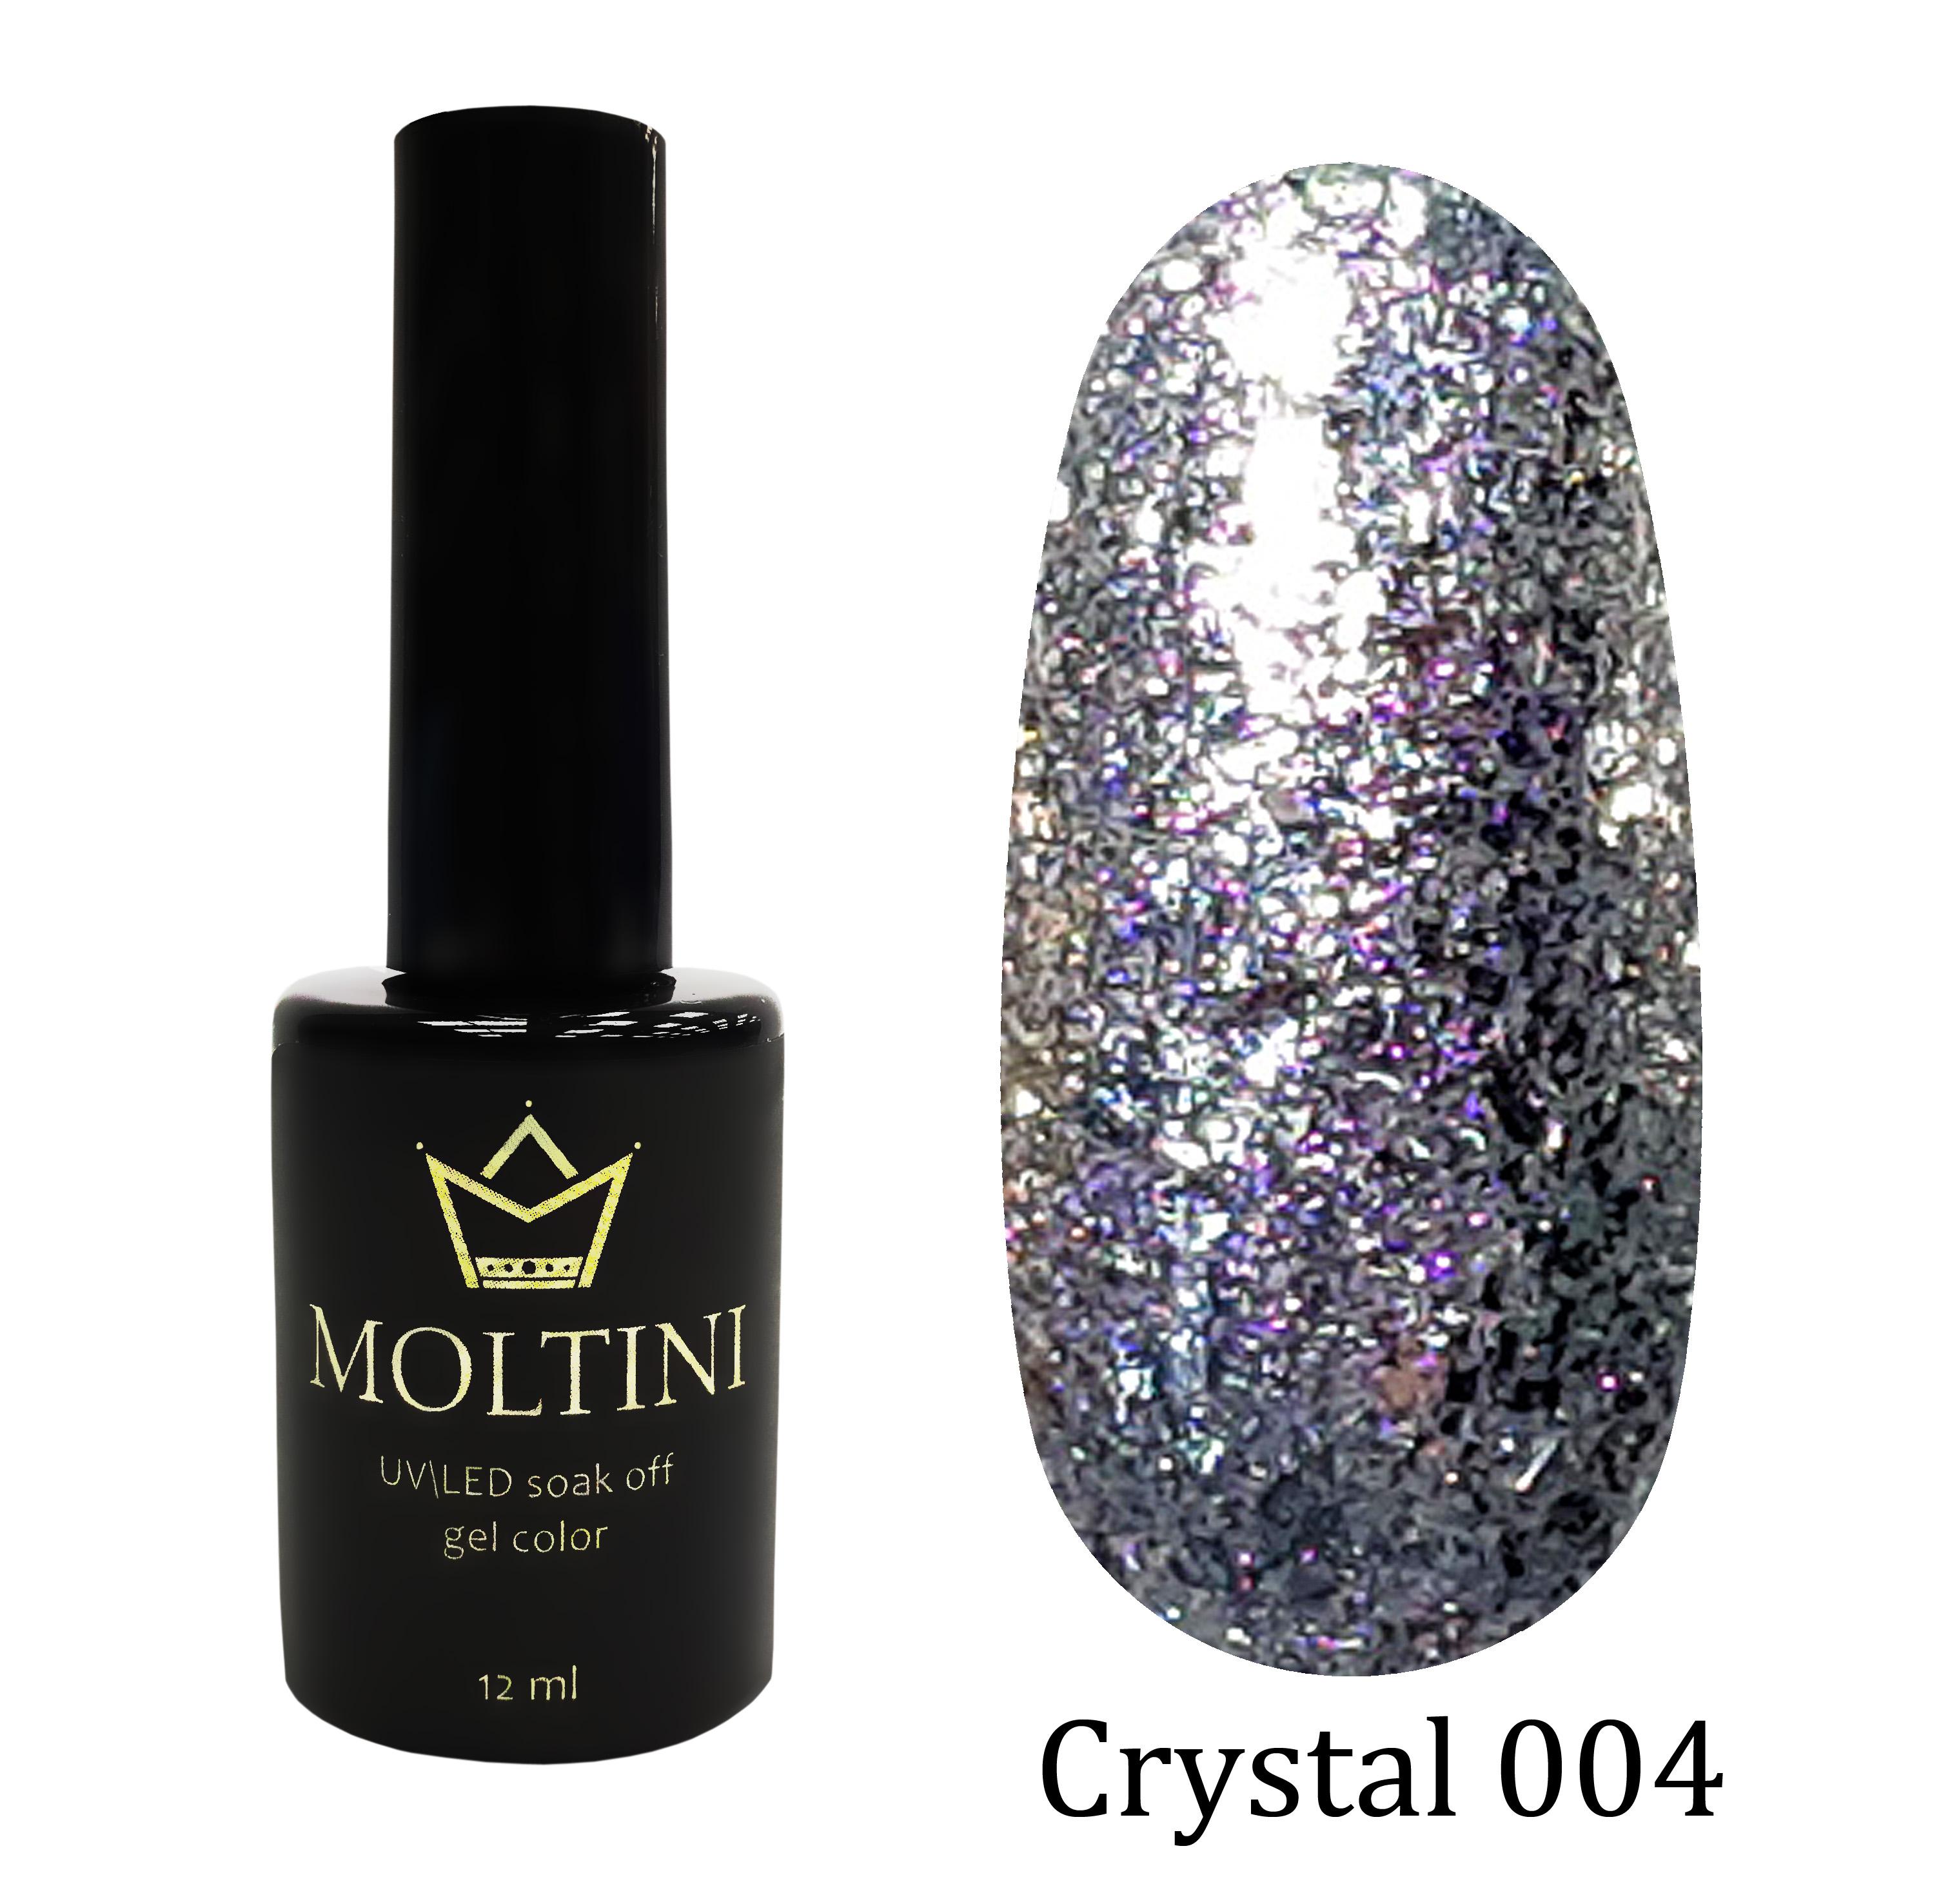 Гель-лак Moltini Crystal 004, 12 ml